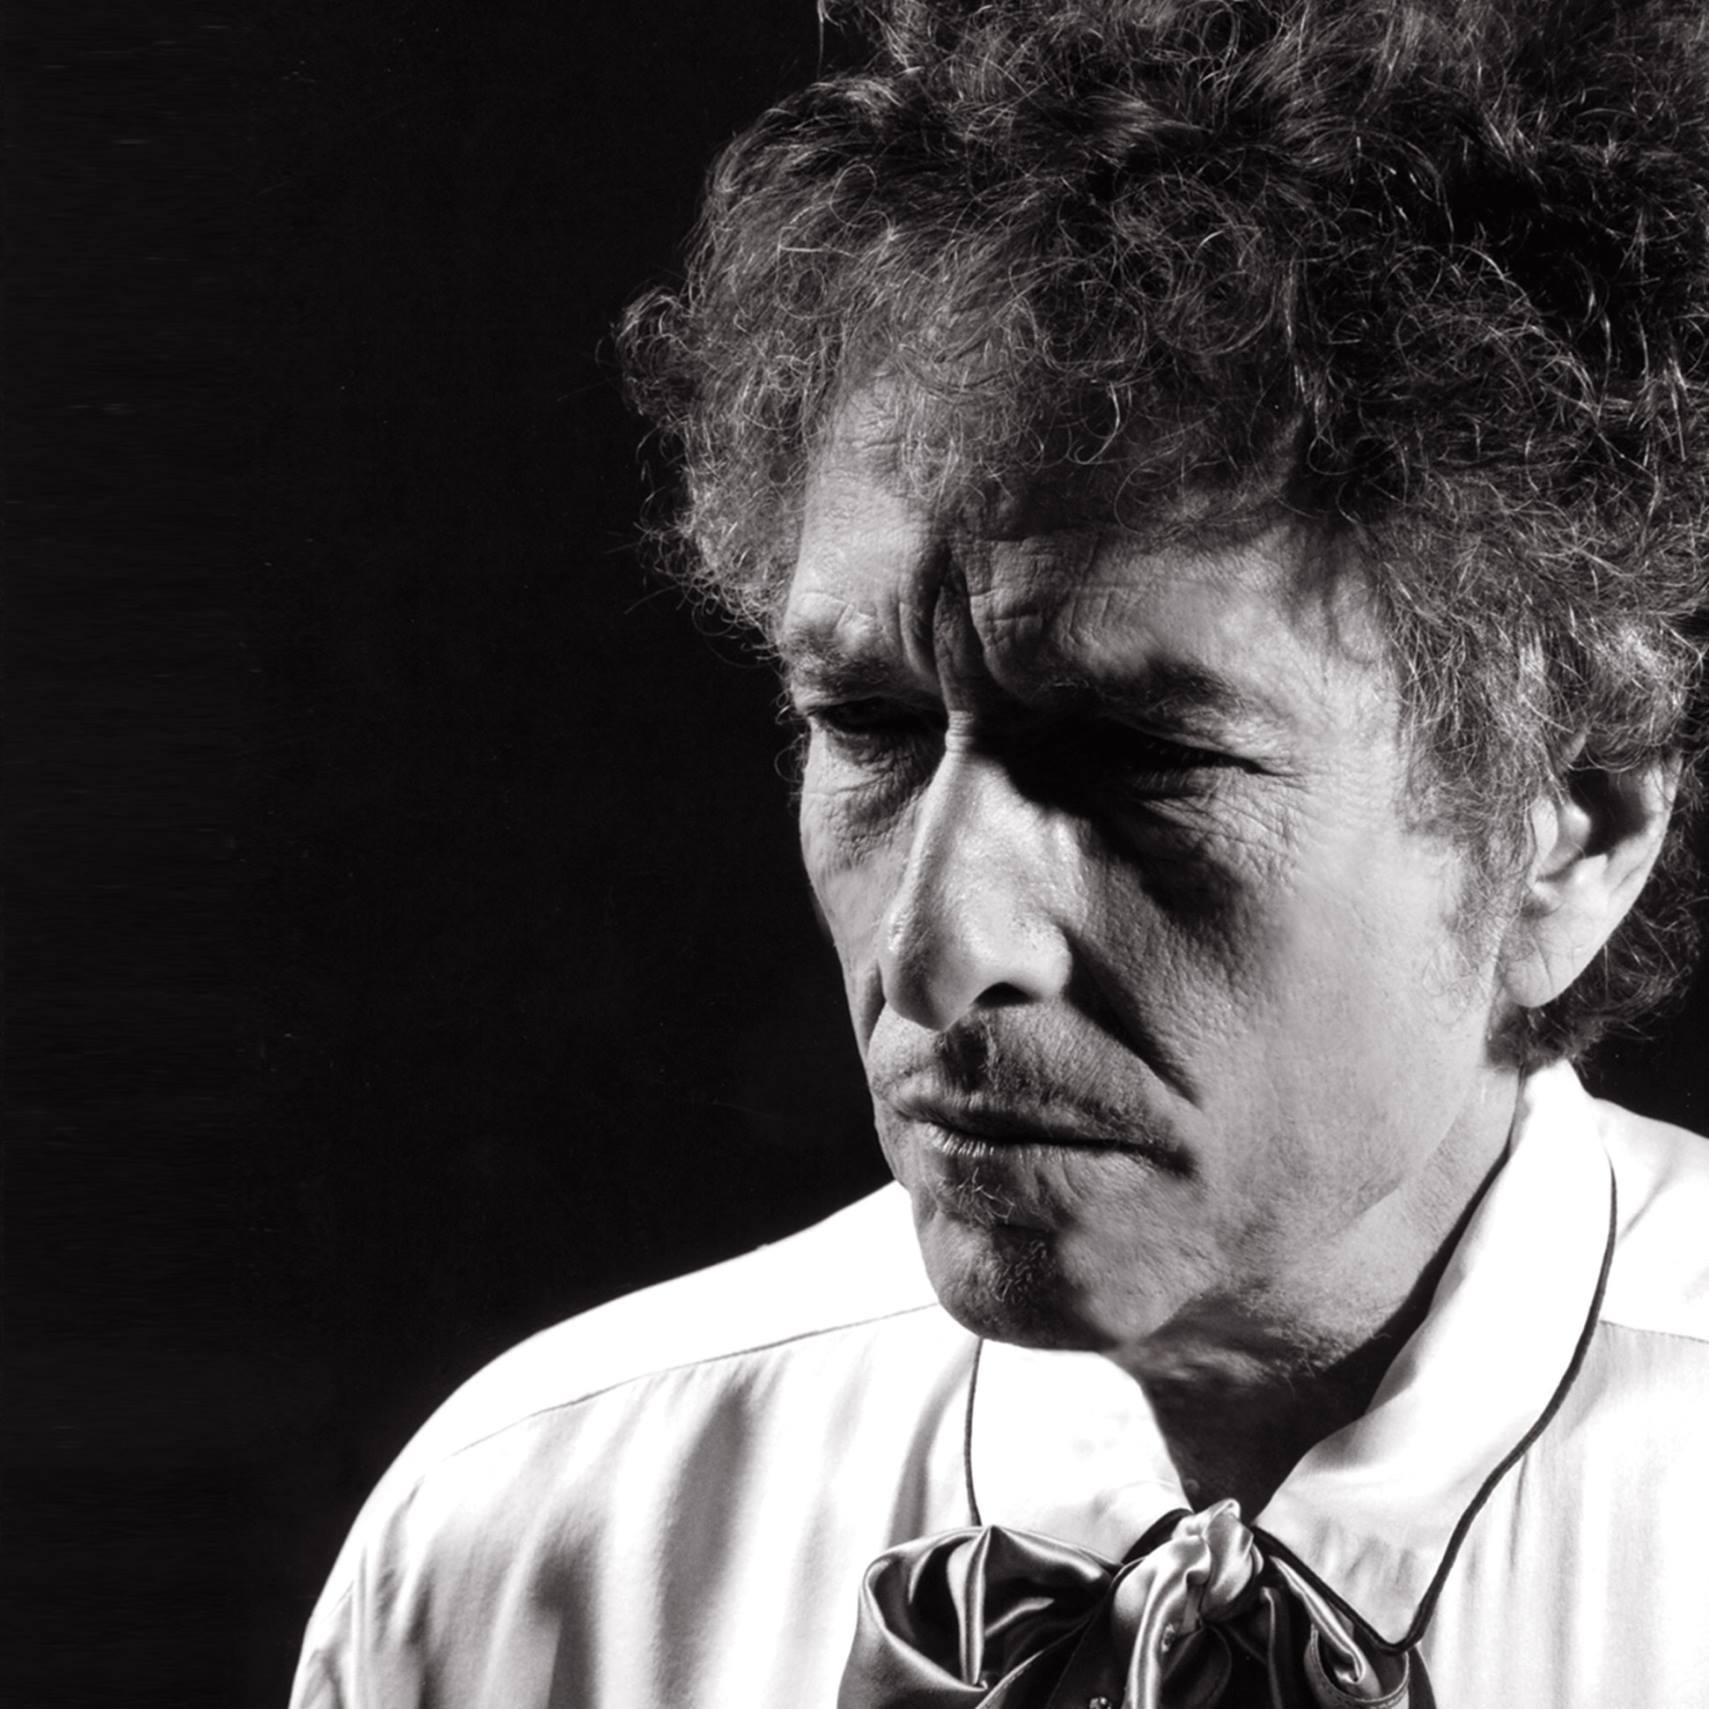 Photo courtesy: Bob Dylan FB